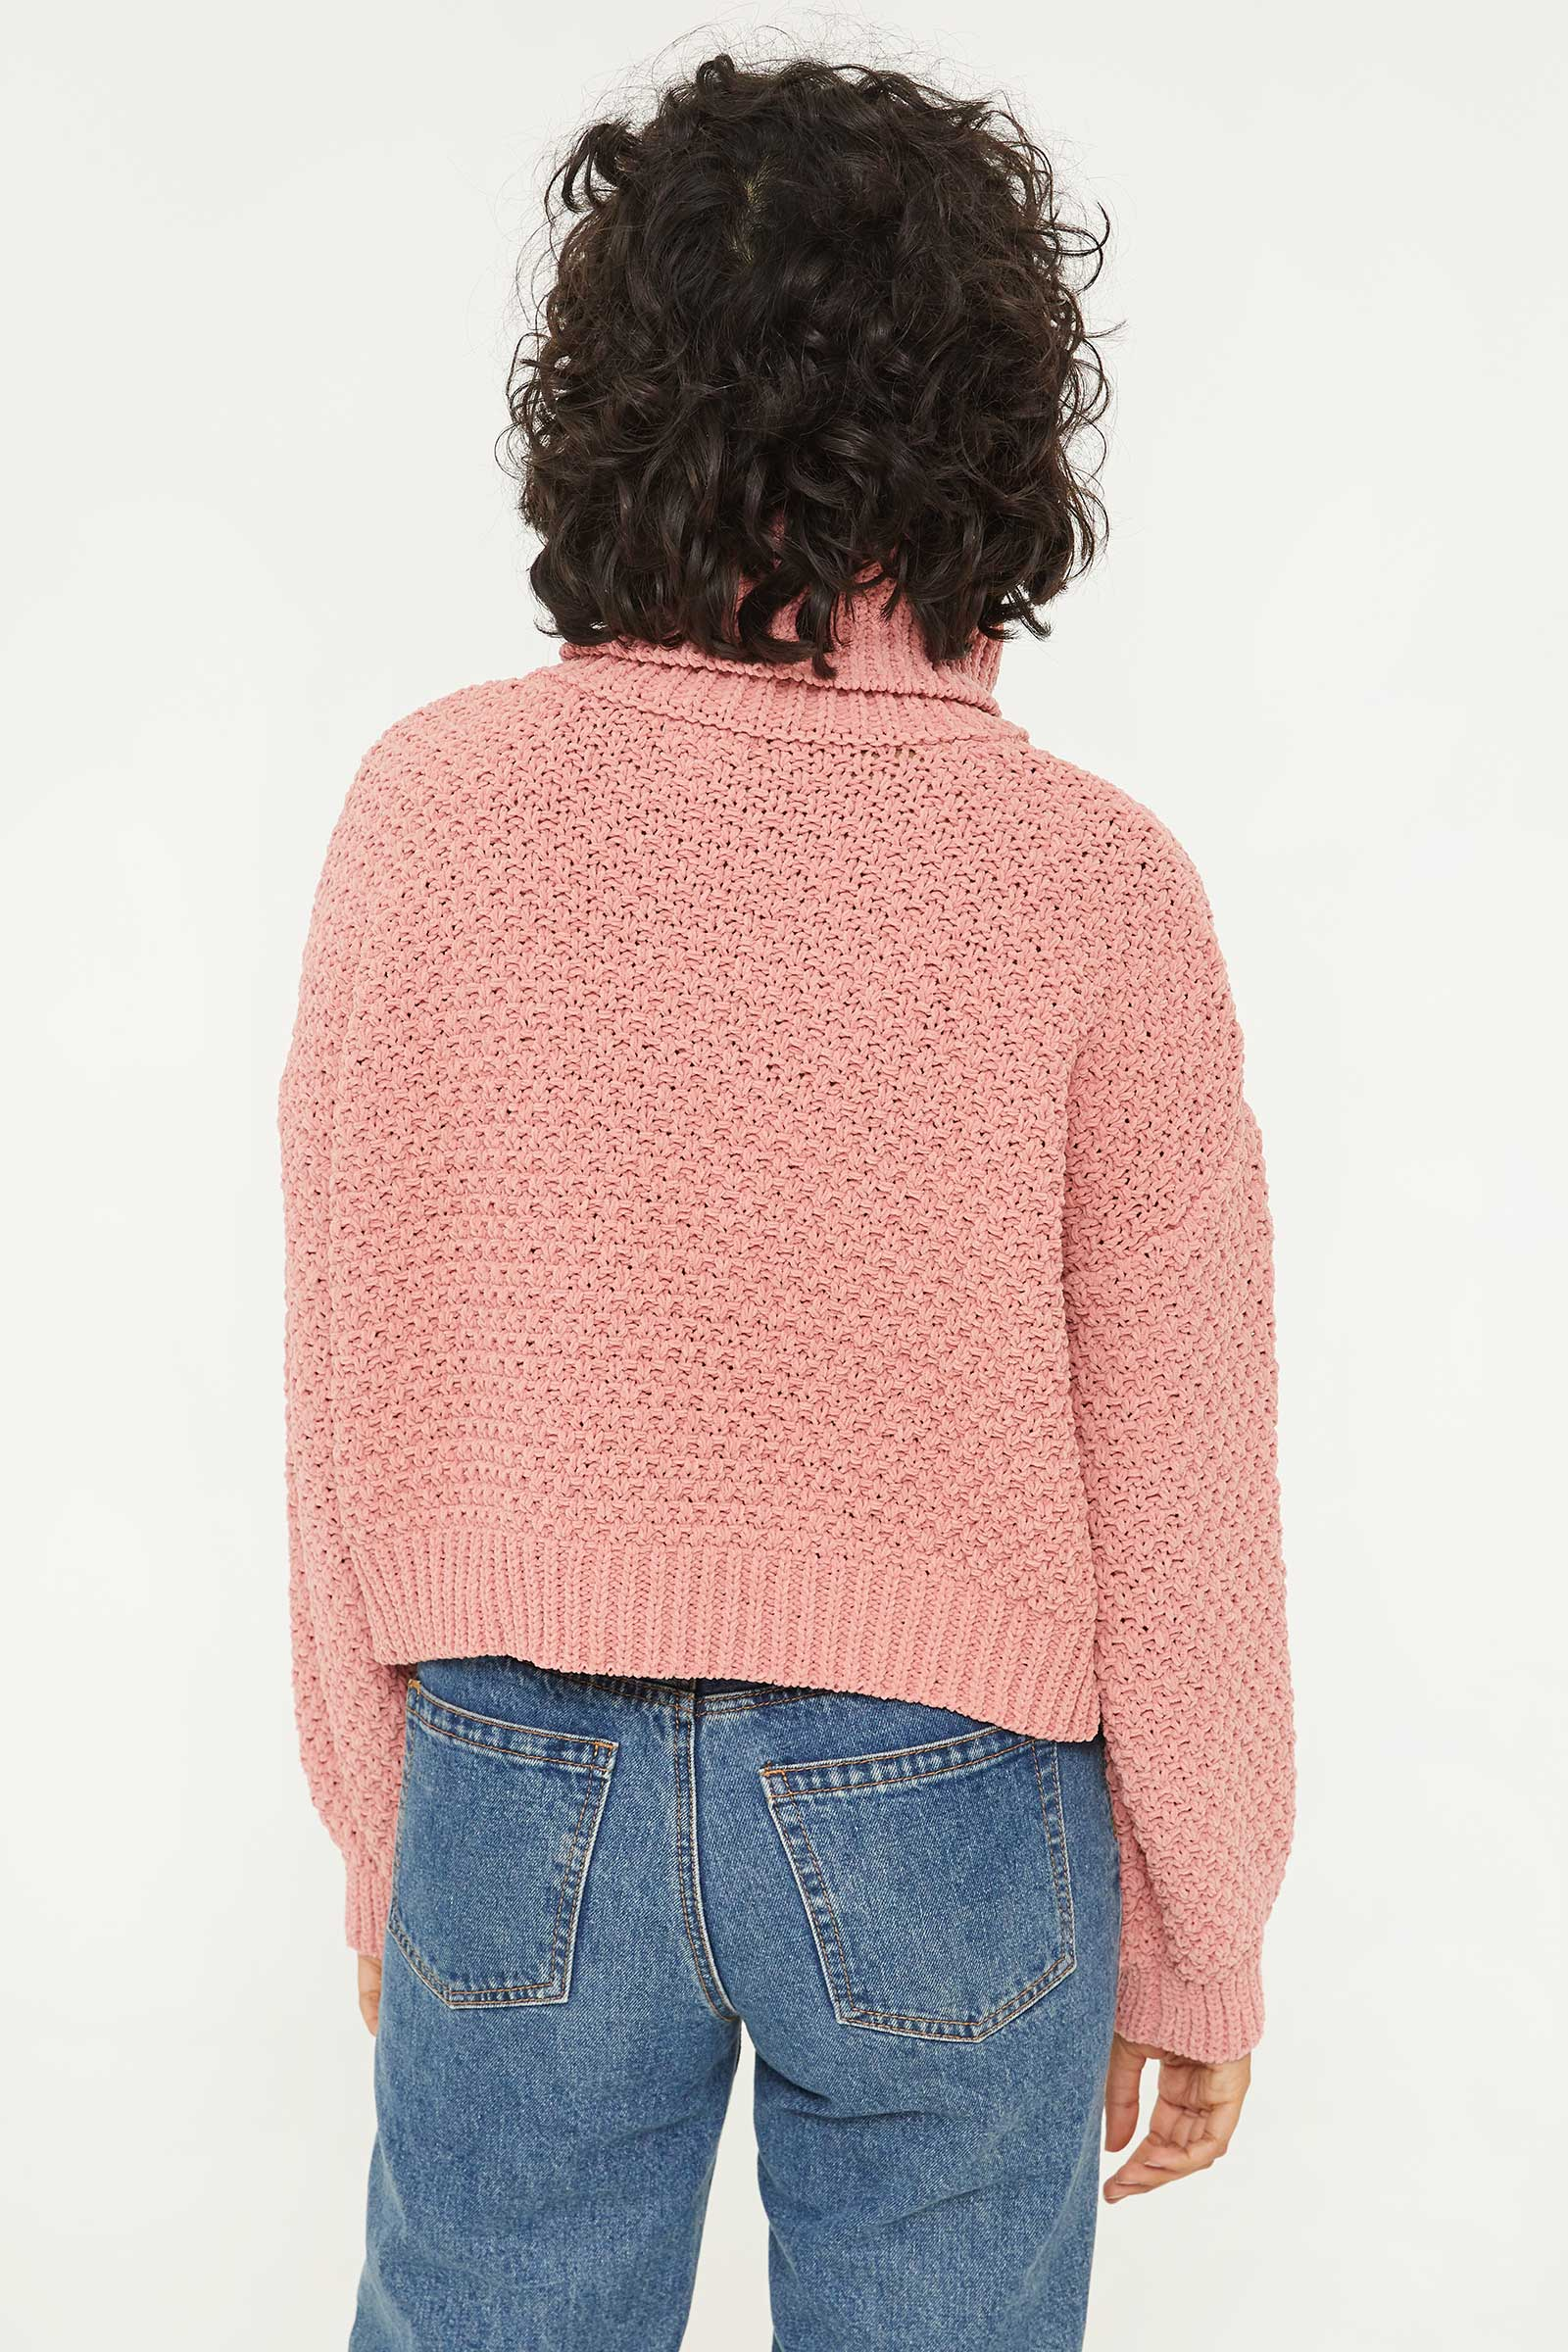 Heavy Turtleneck Sweater